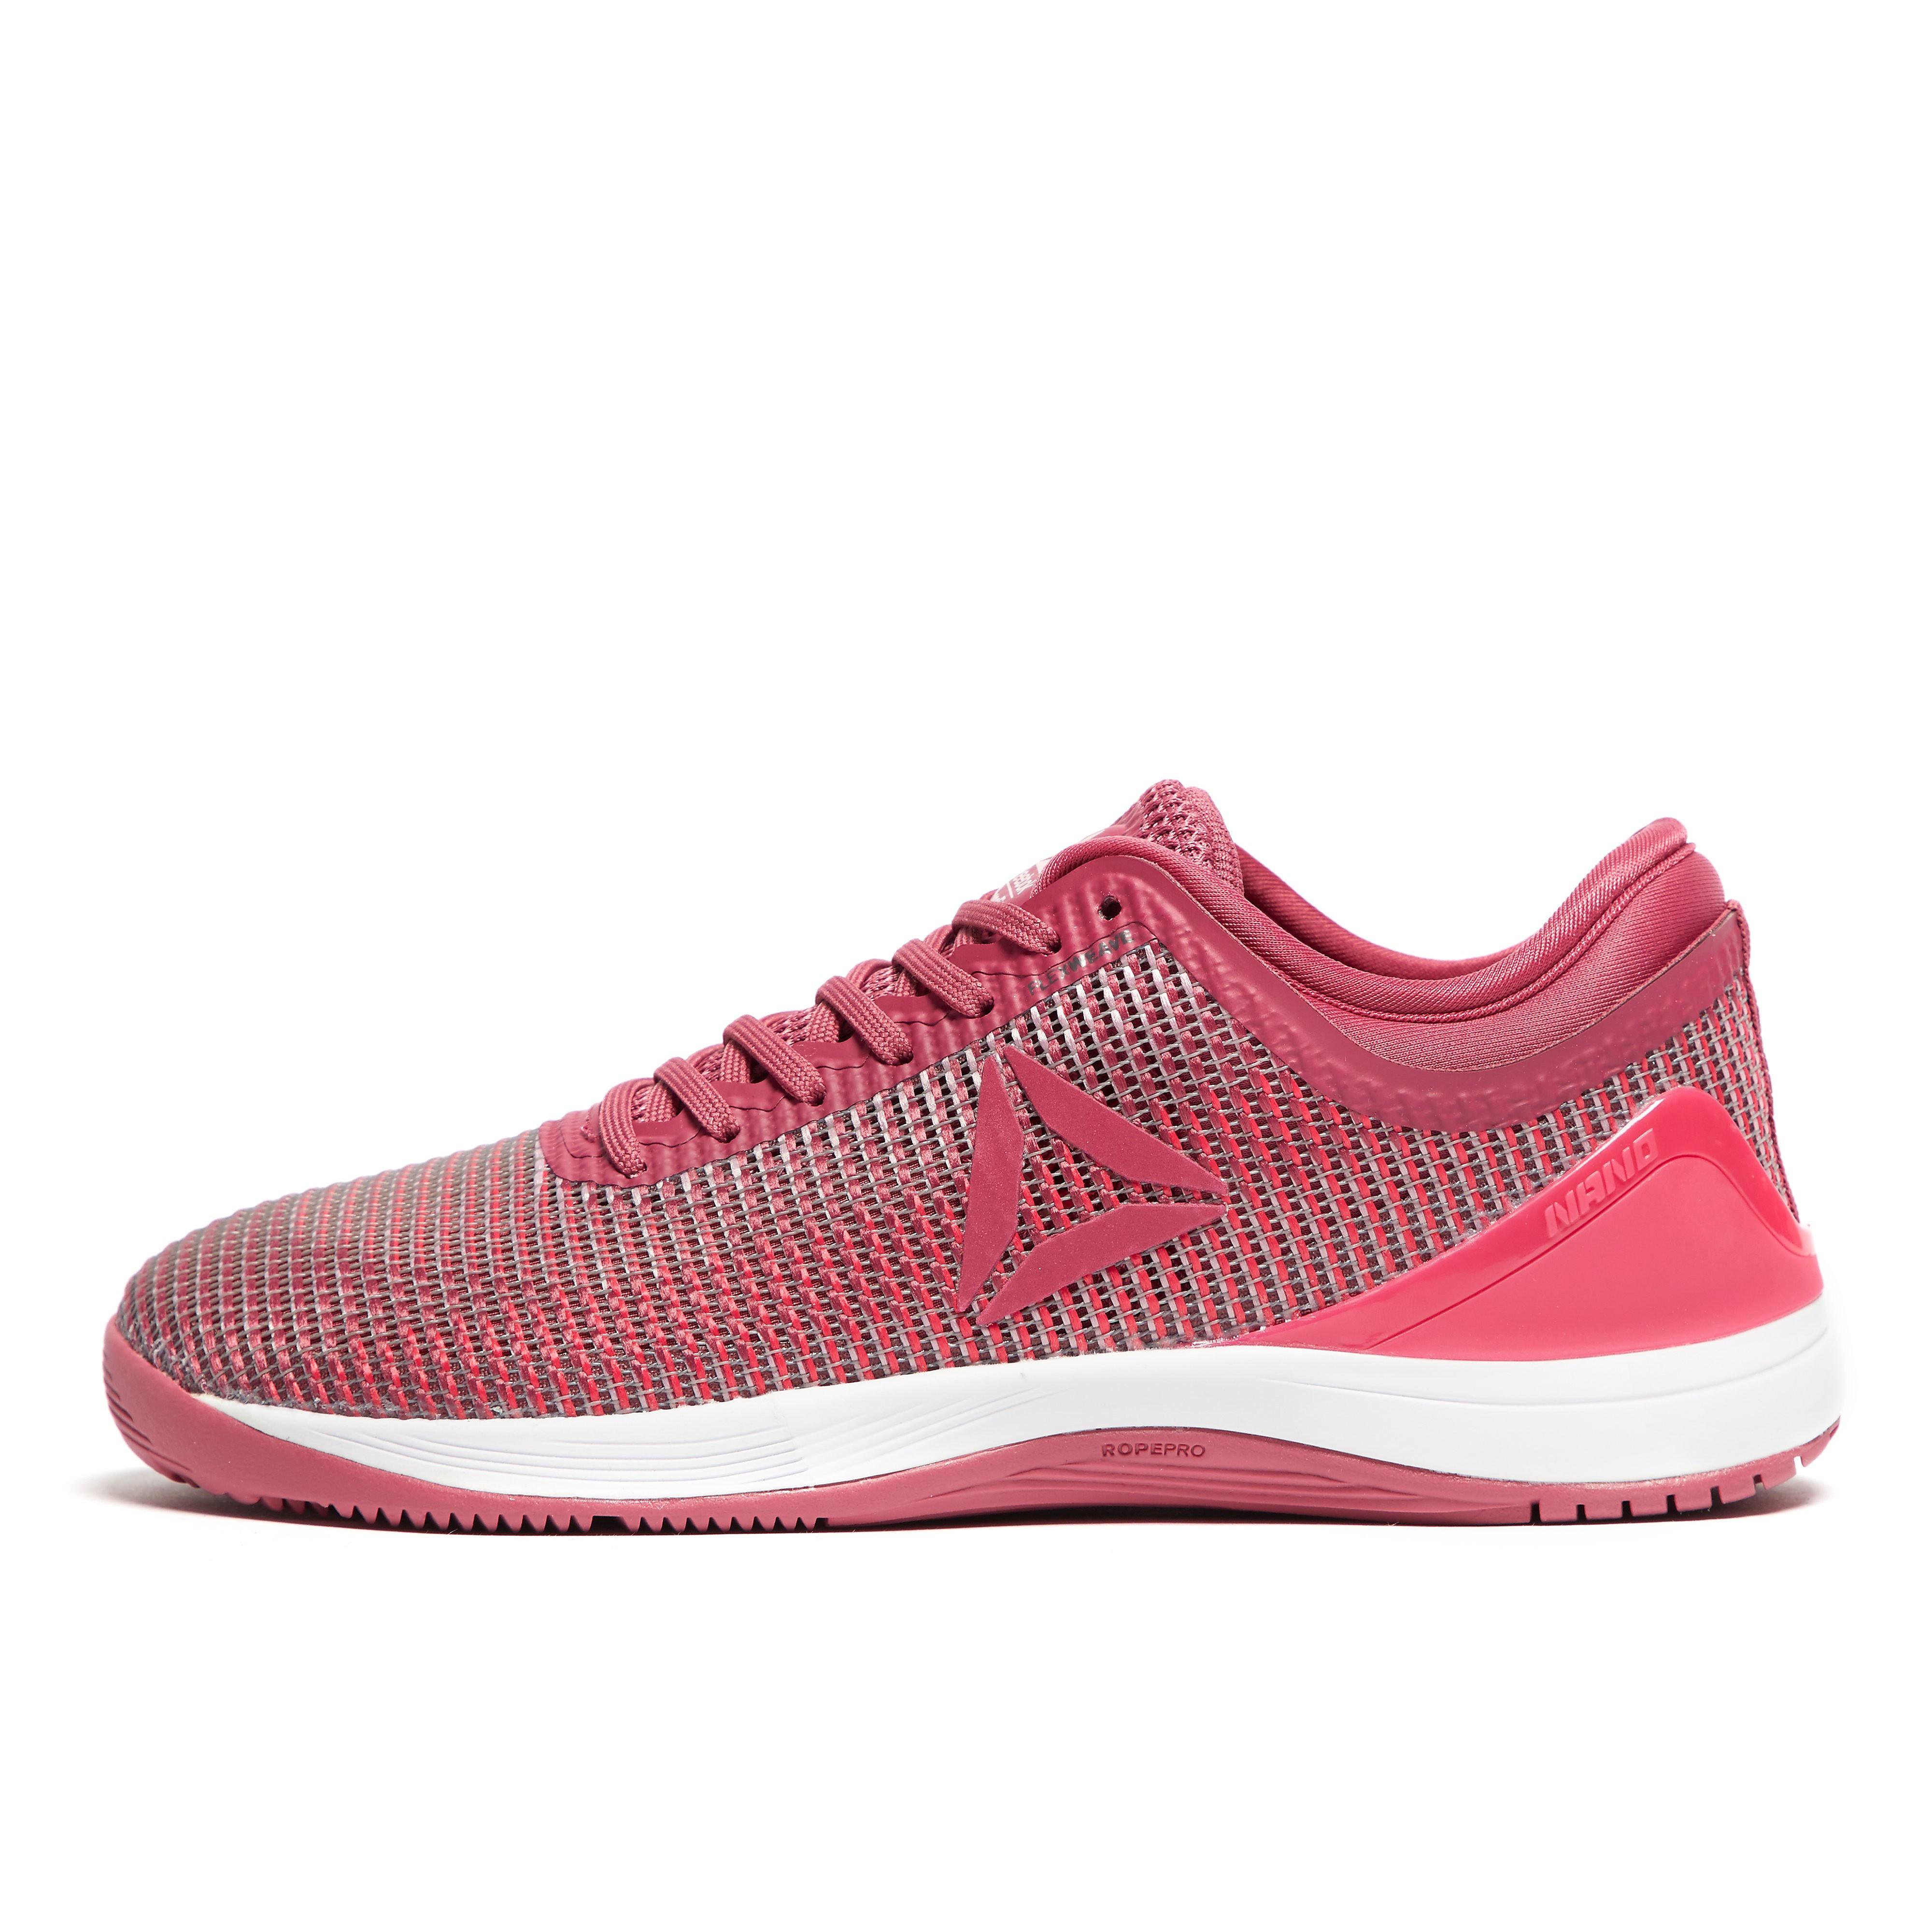 Womens Pink Reebok Crossfit Nano 8.0 Training Shoes